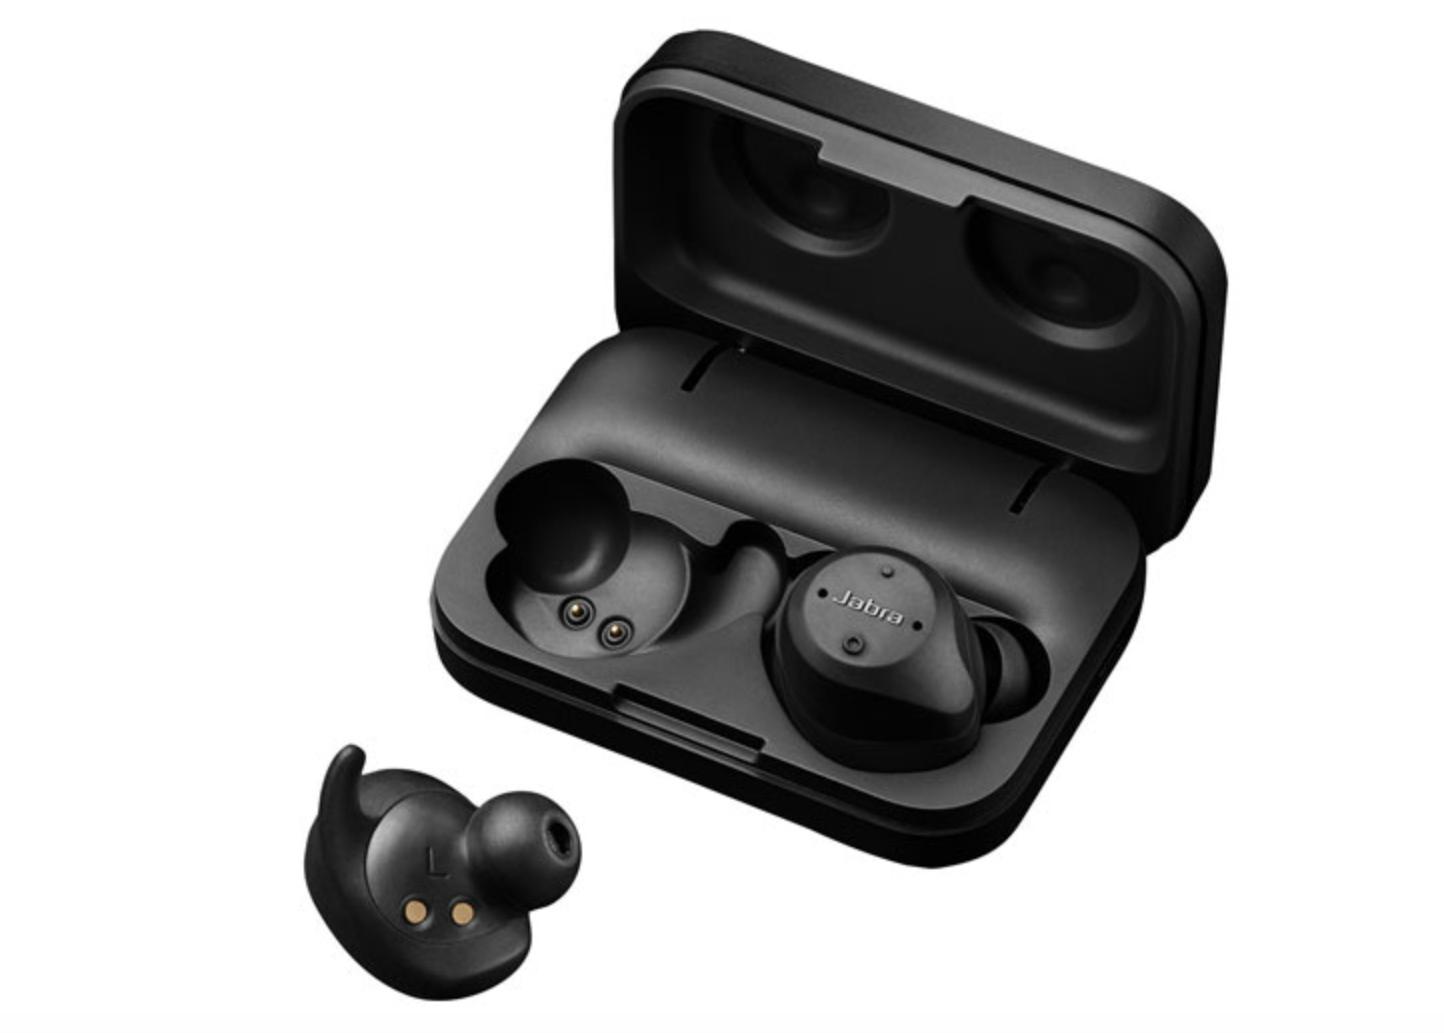 sabra elite sport true wireless earbuds